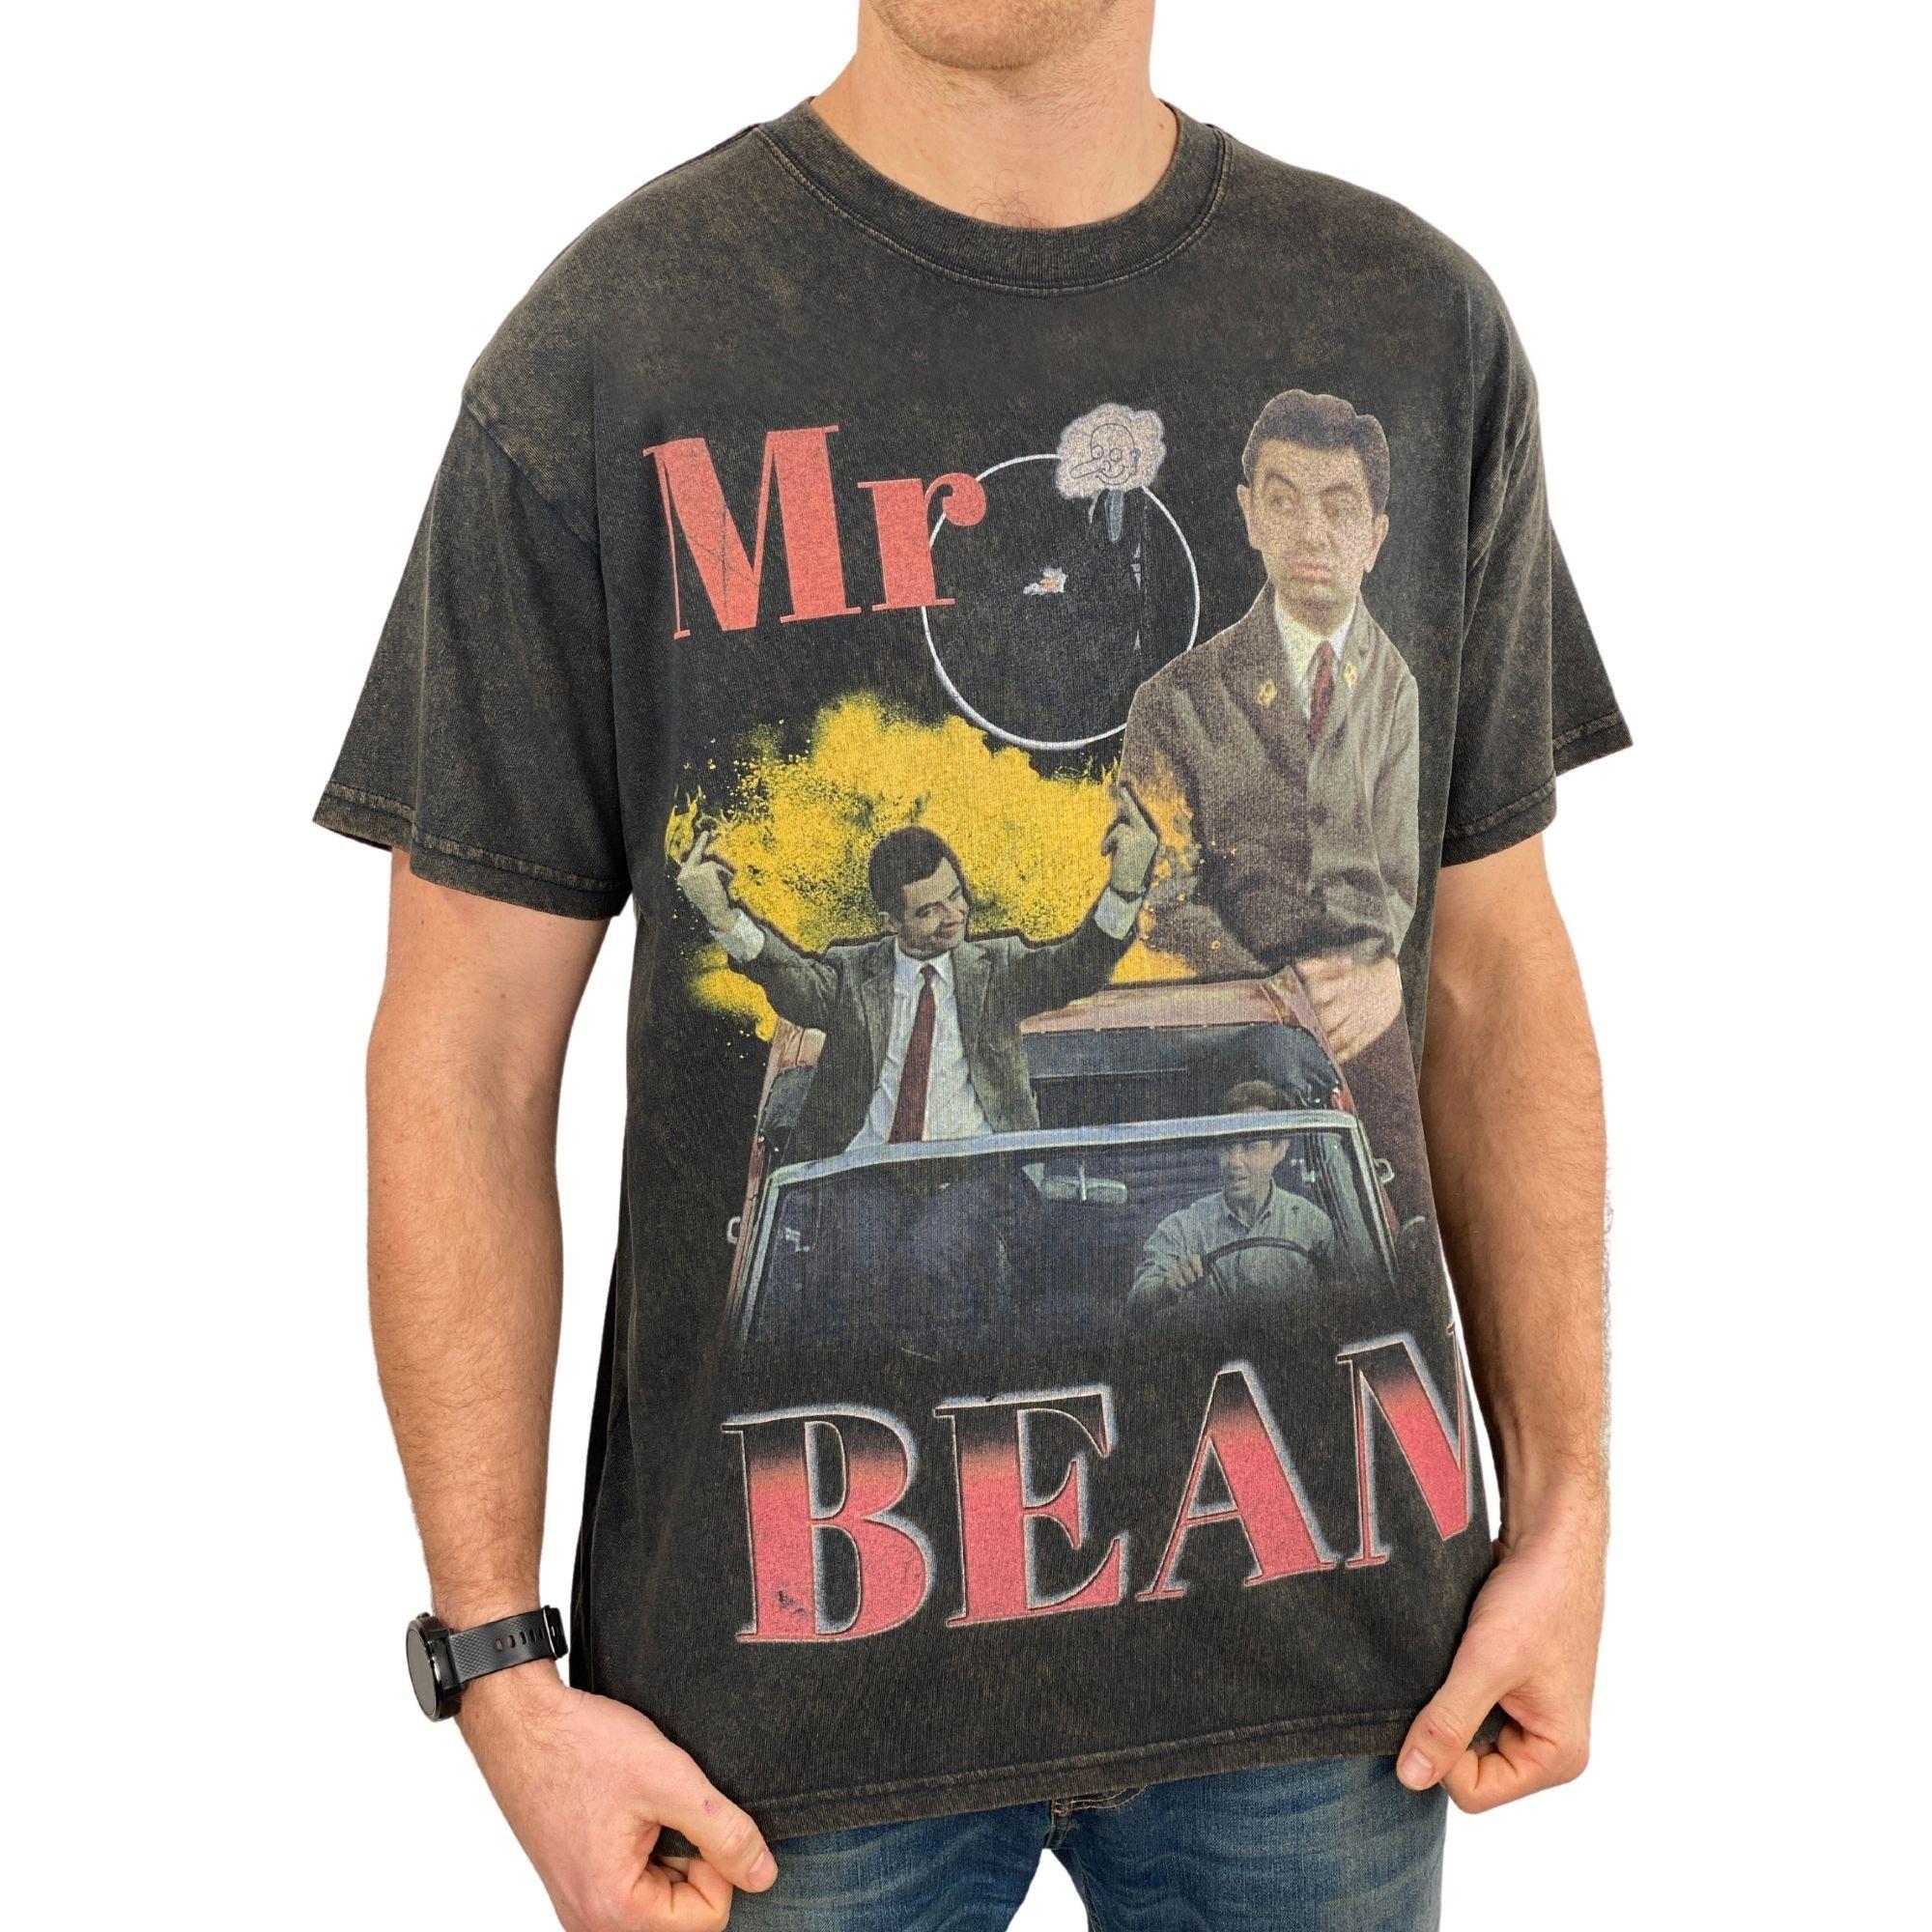 VINTAGE MR BEAN T-SHIRT